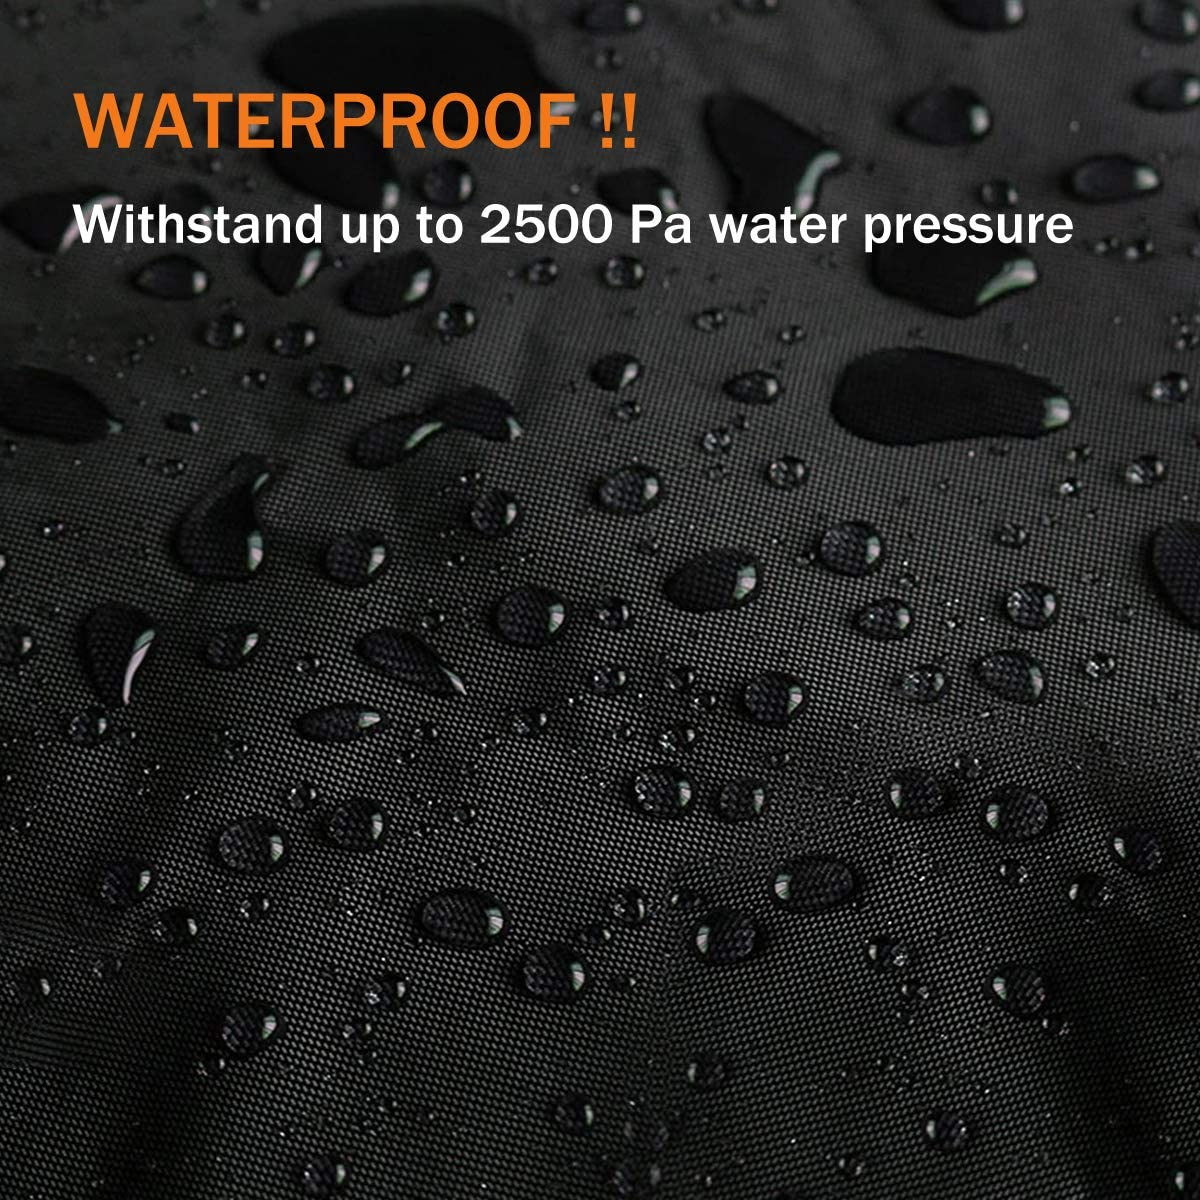 UTV Cover Waterproof 4-6 Seater Heavy Duty Oxford Cloth Black Suit for Polaris RZR Yamaha Can-Am Defender Kawasaki Ranger